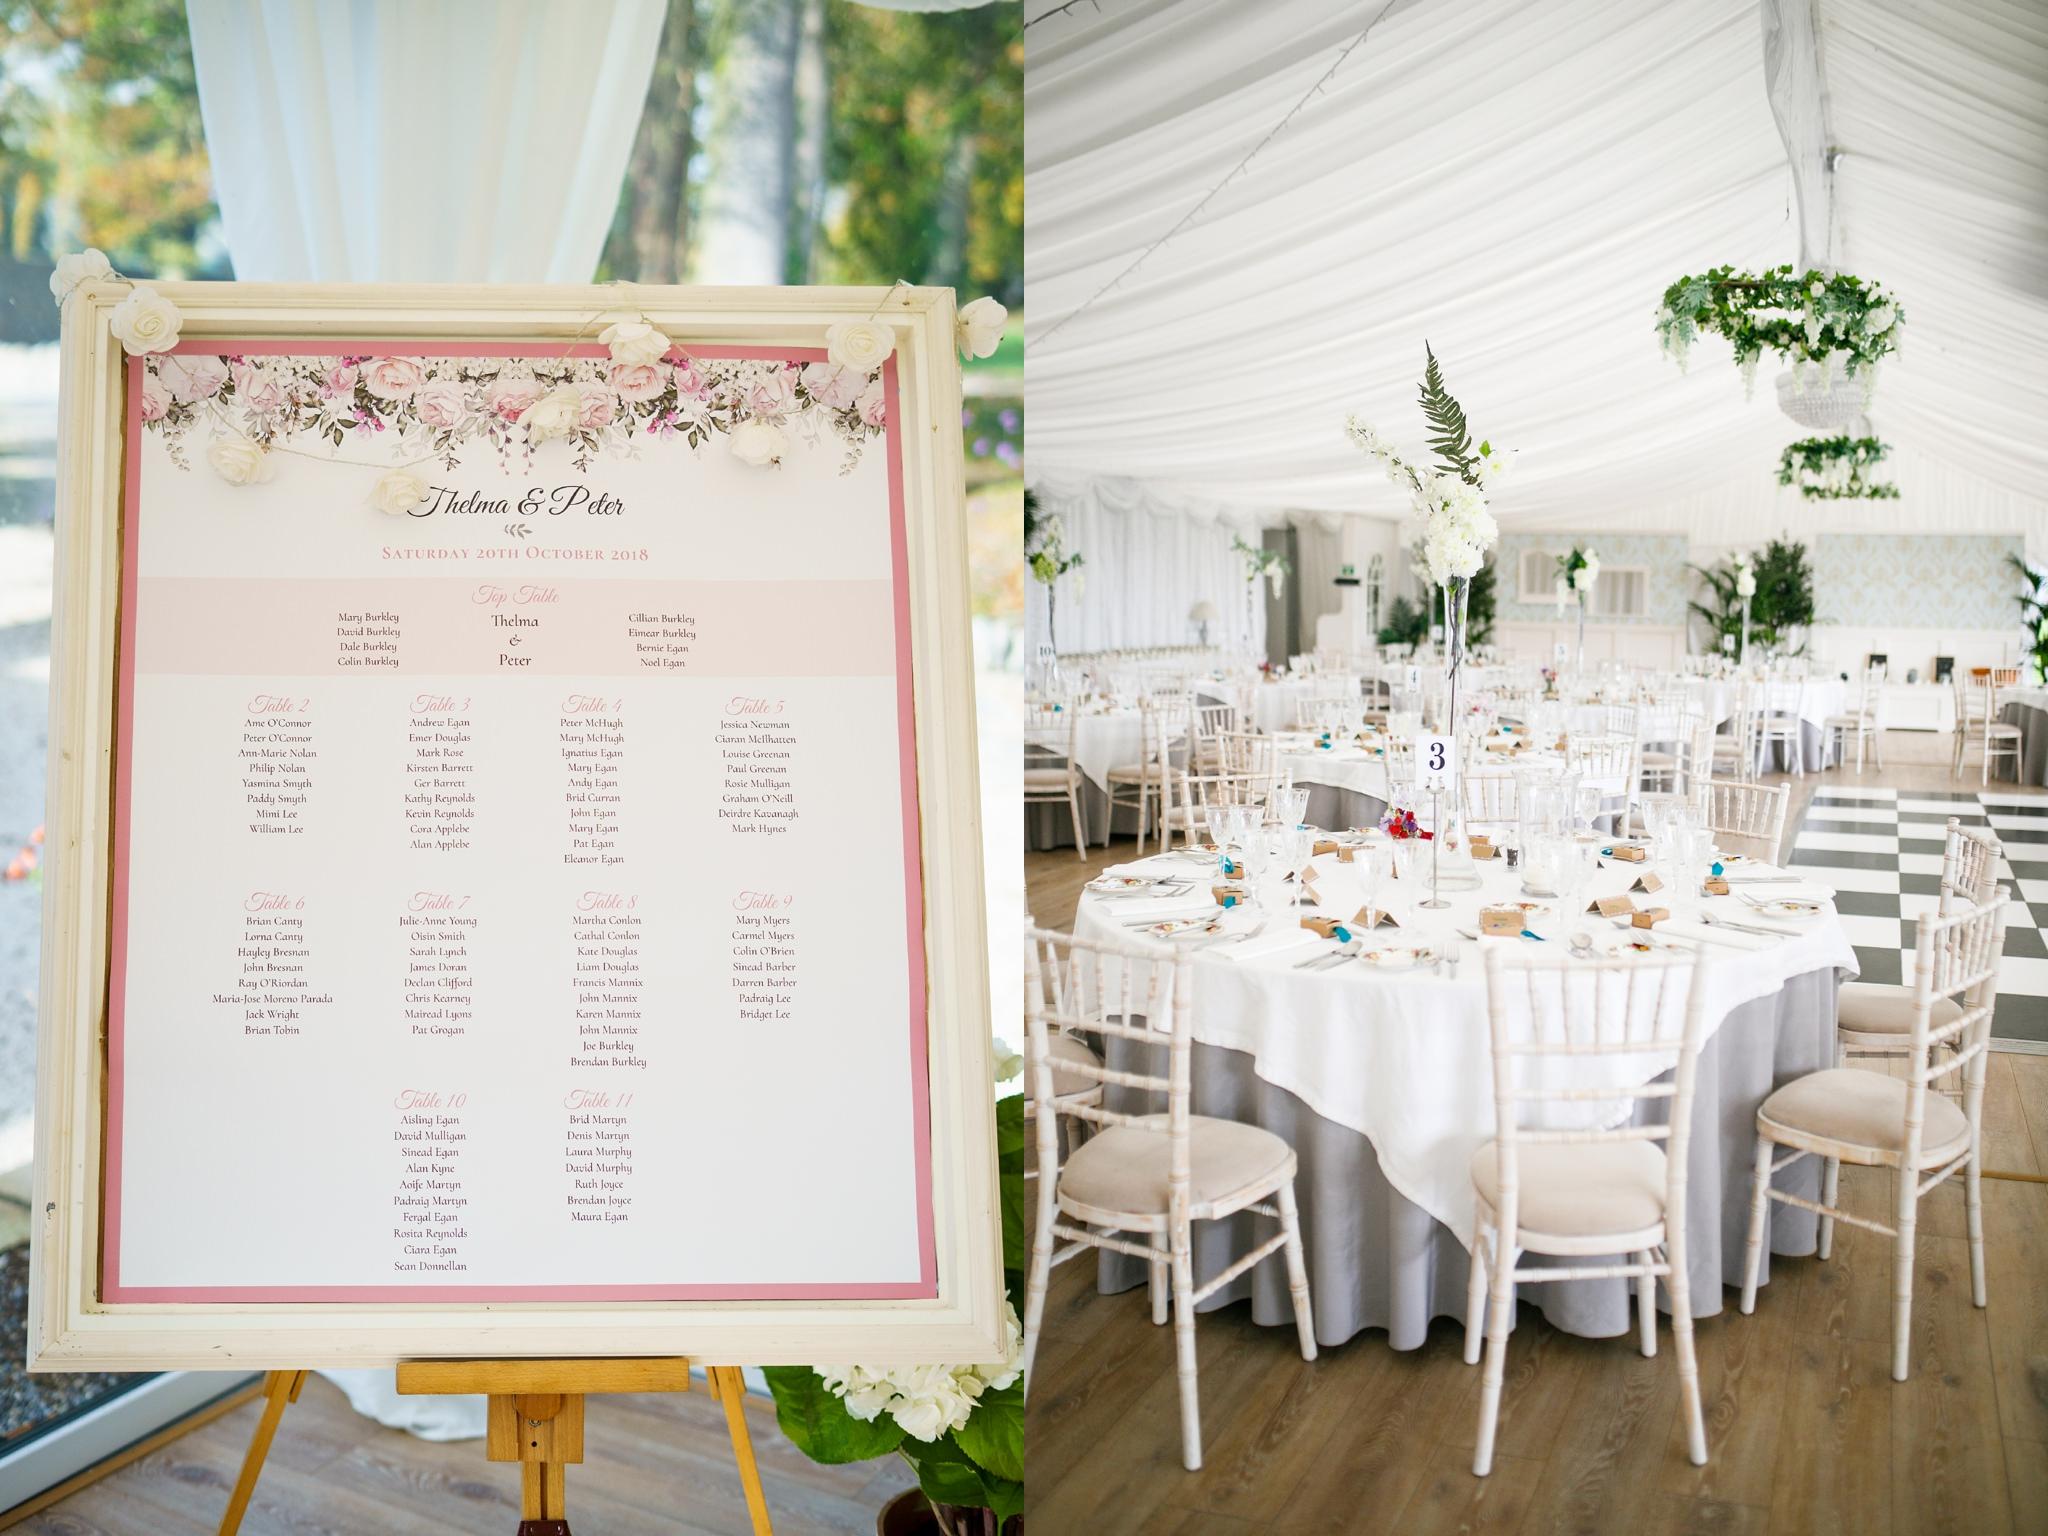 Elisha-Clarke-Photography-Dublin-City-Wedding_0041.jpg